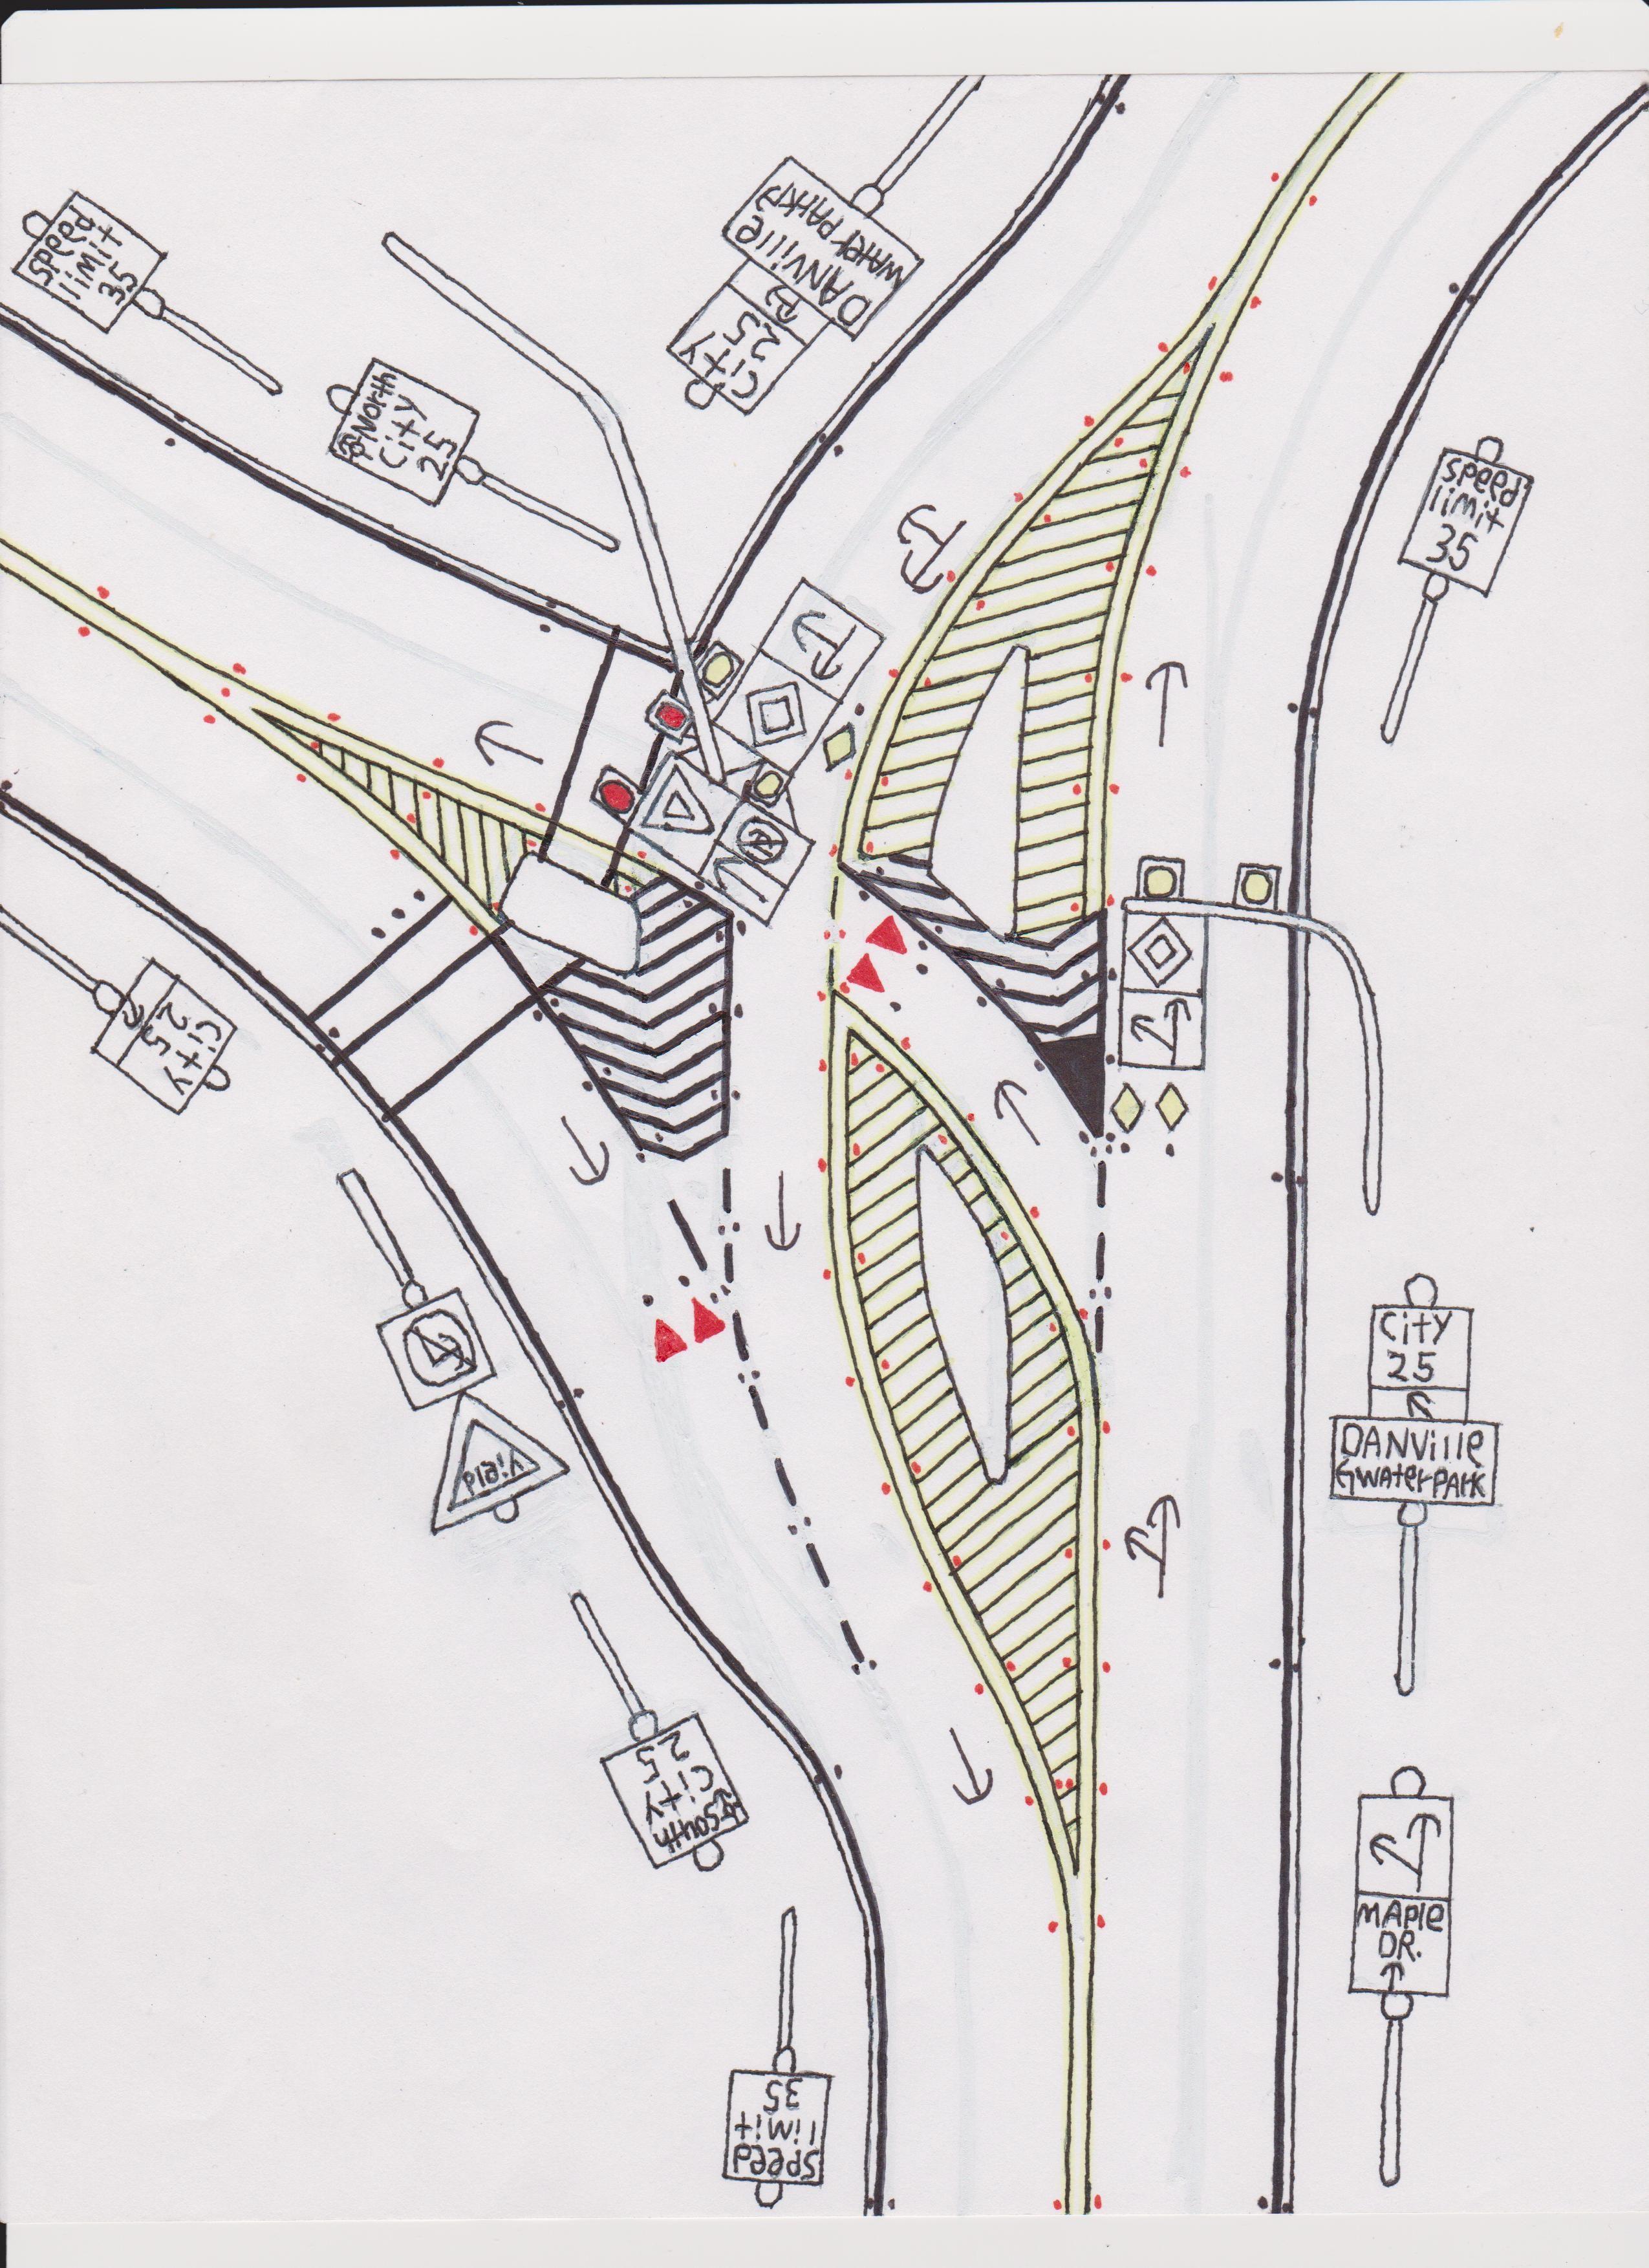 Road Drawings | Road Drawings Stuff | Pinterest | Drawing ...